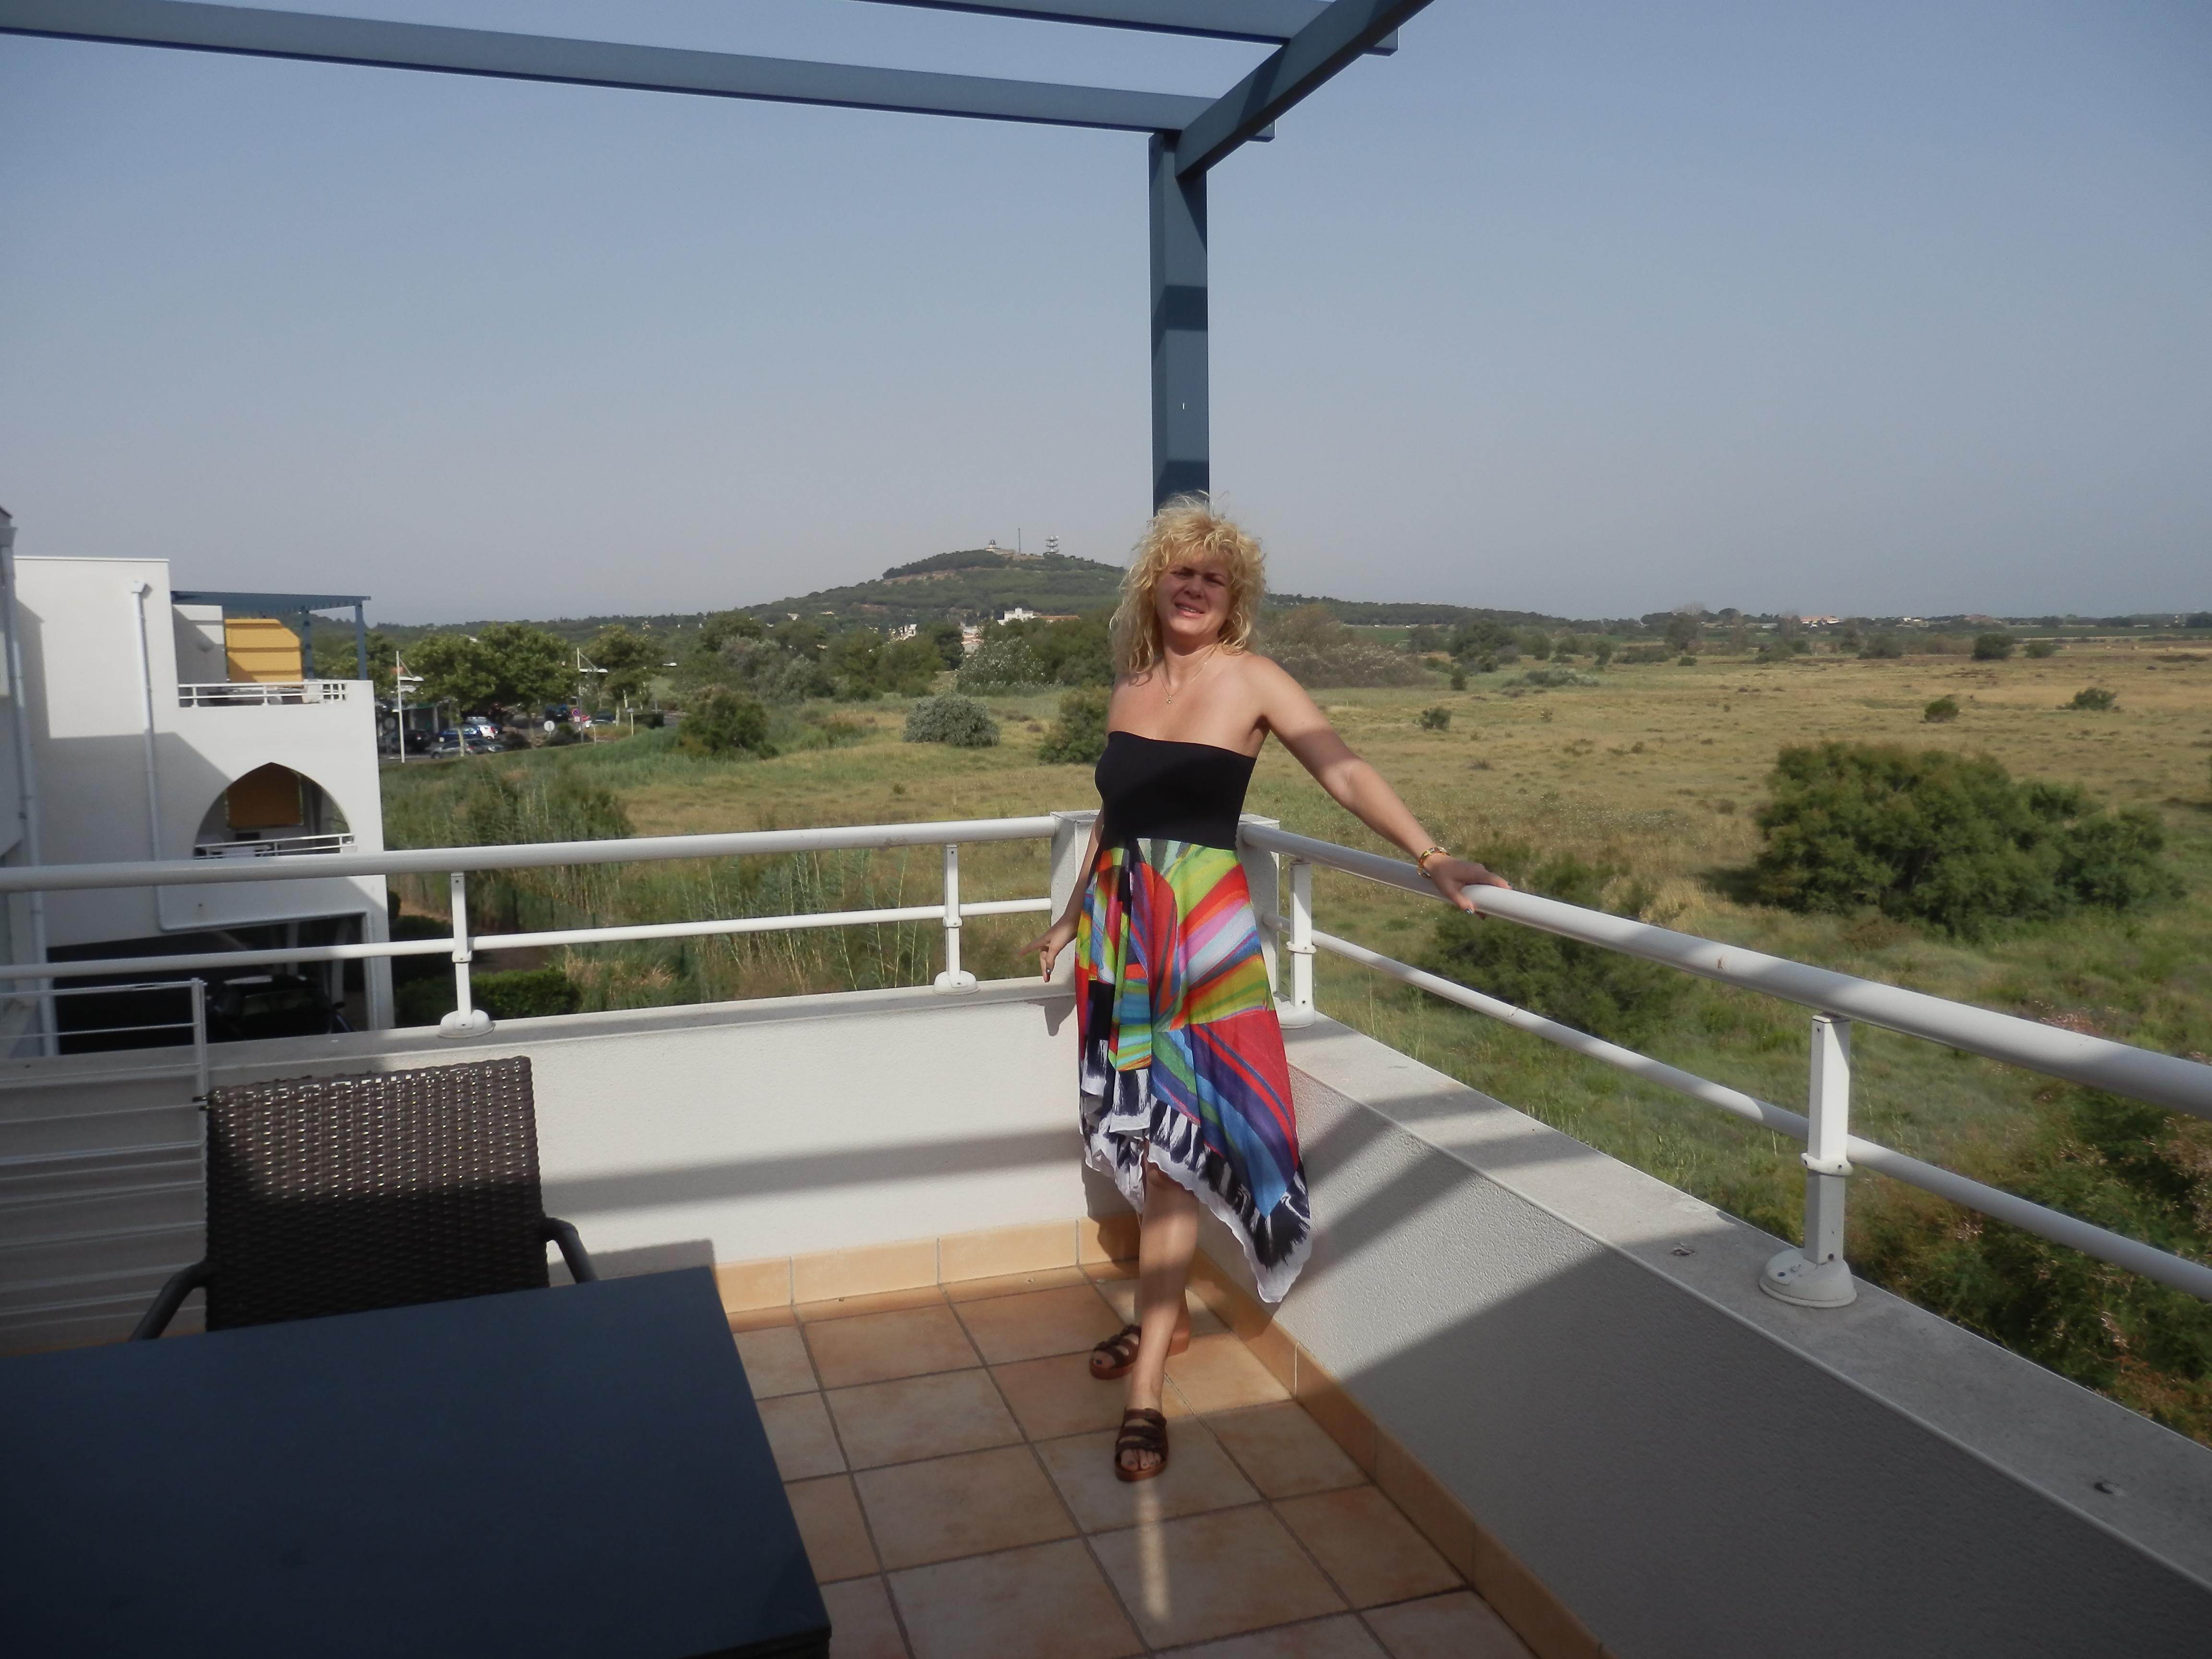 Юлия варра голая фото 4 фотография